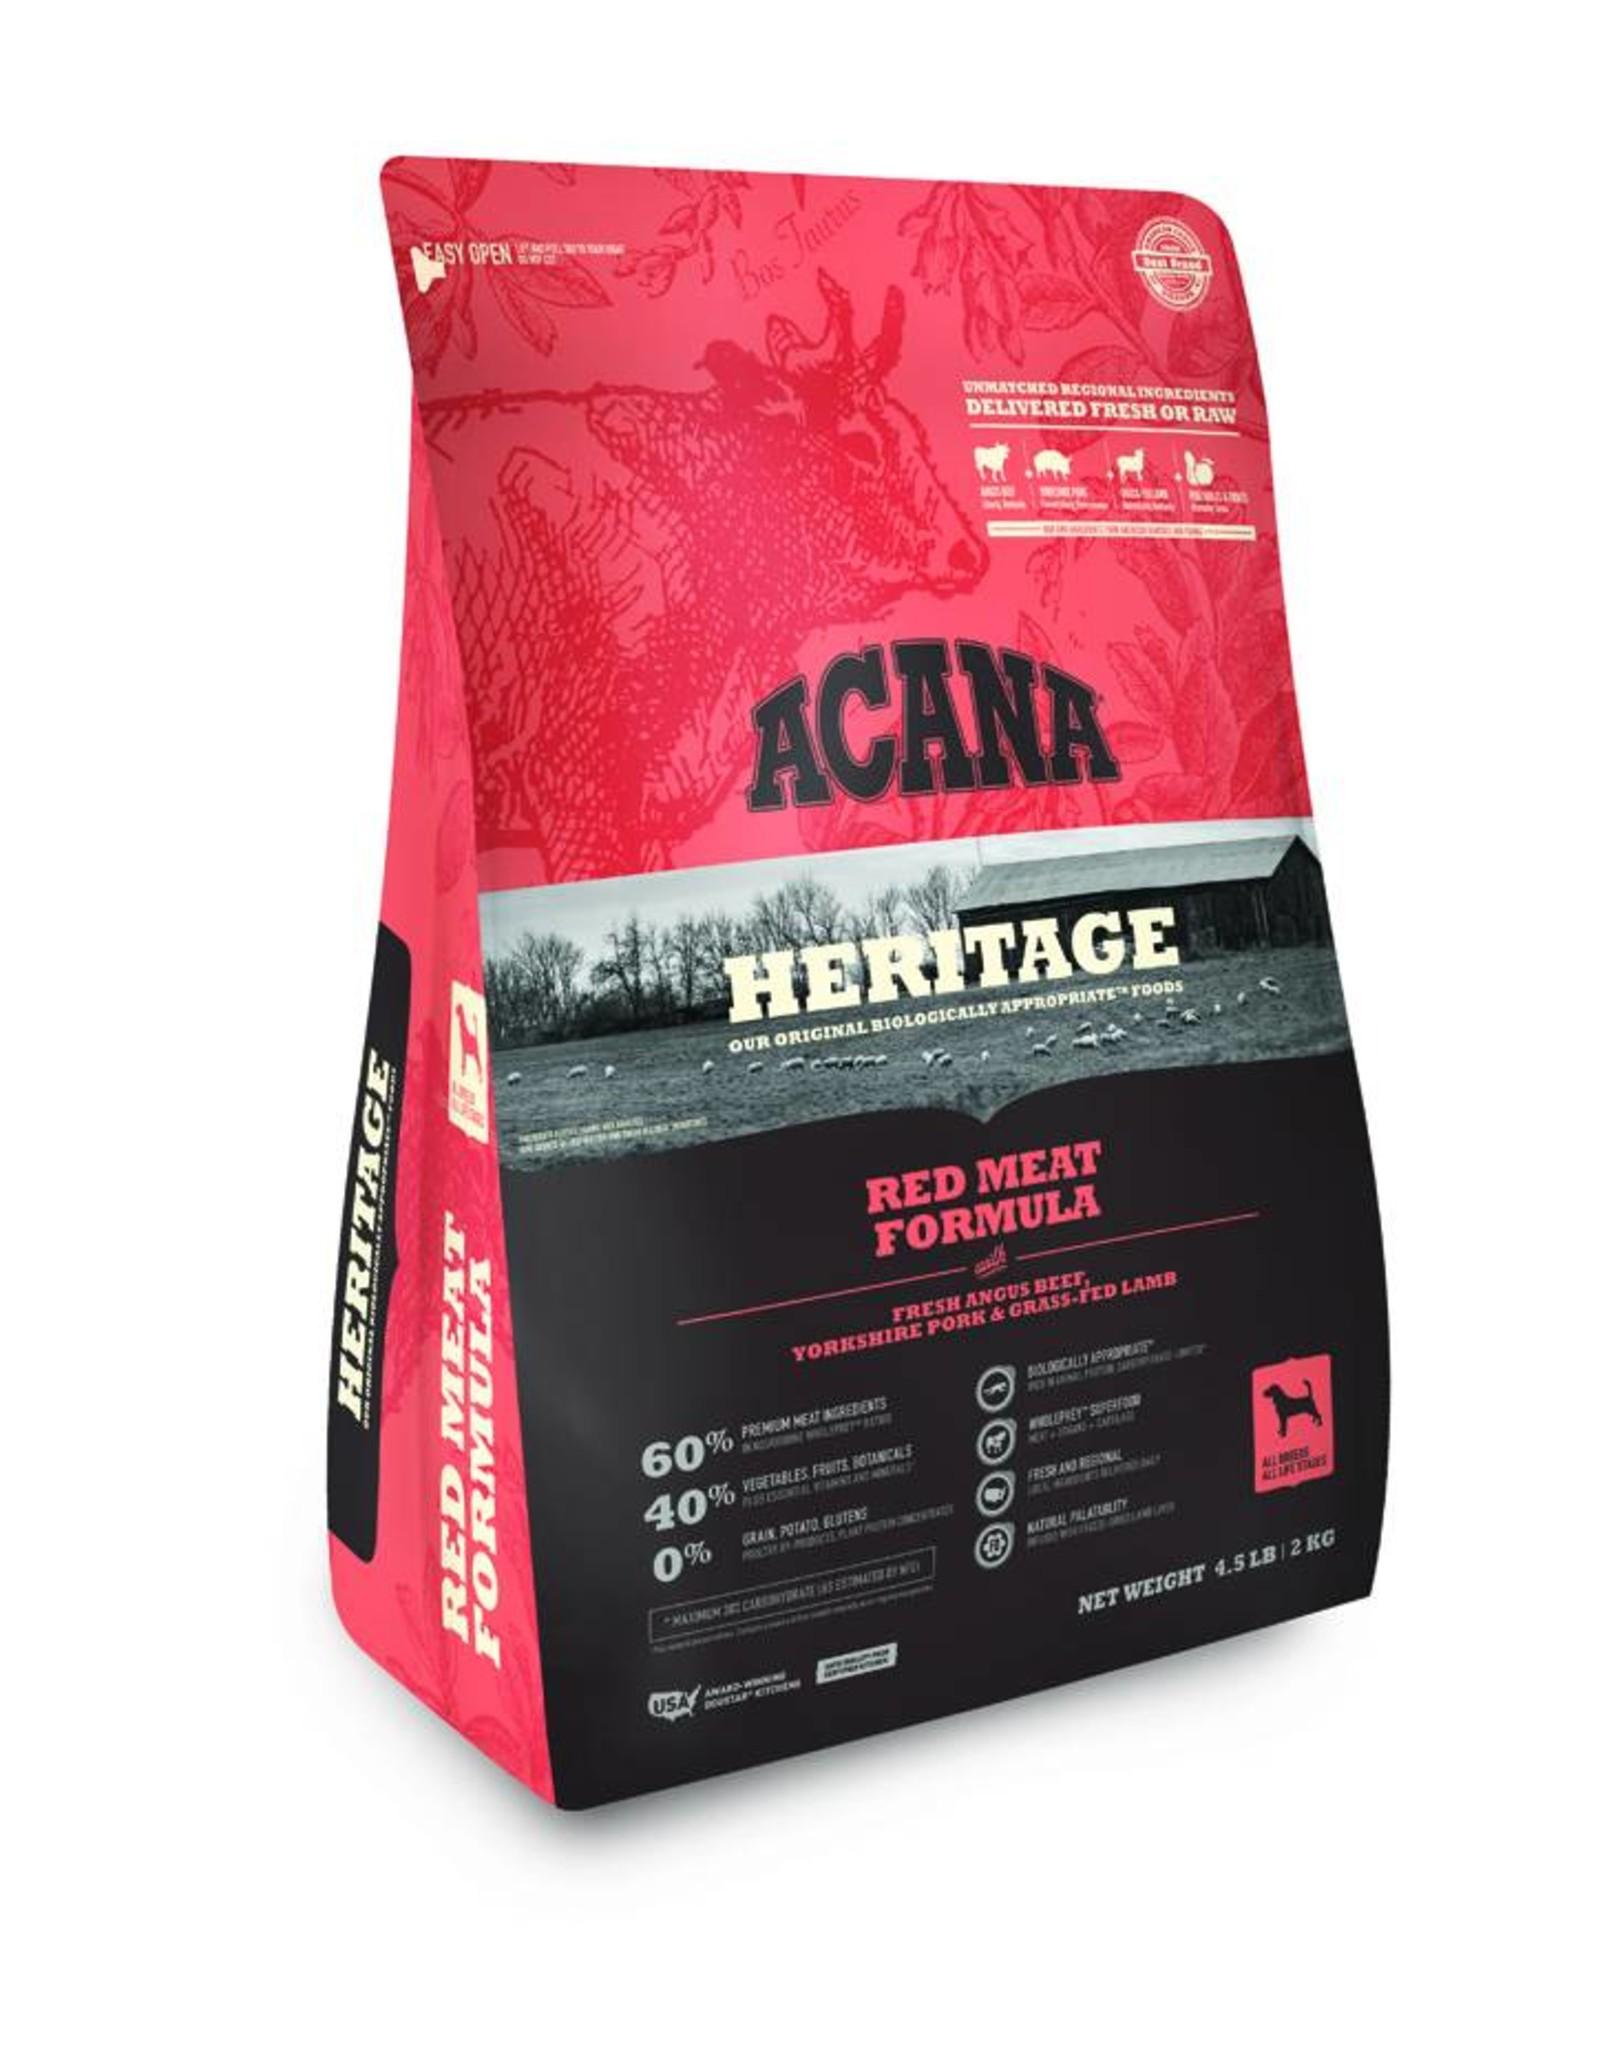 ACANA Acana Heritage   Red Meats Dog Formula